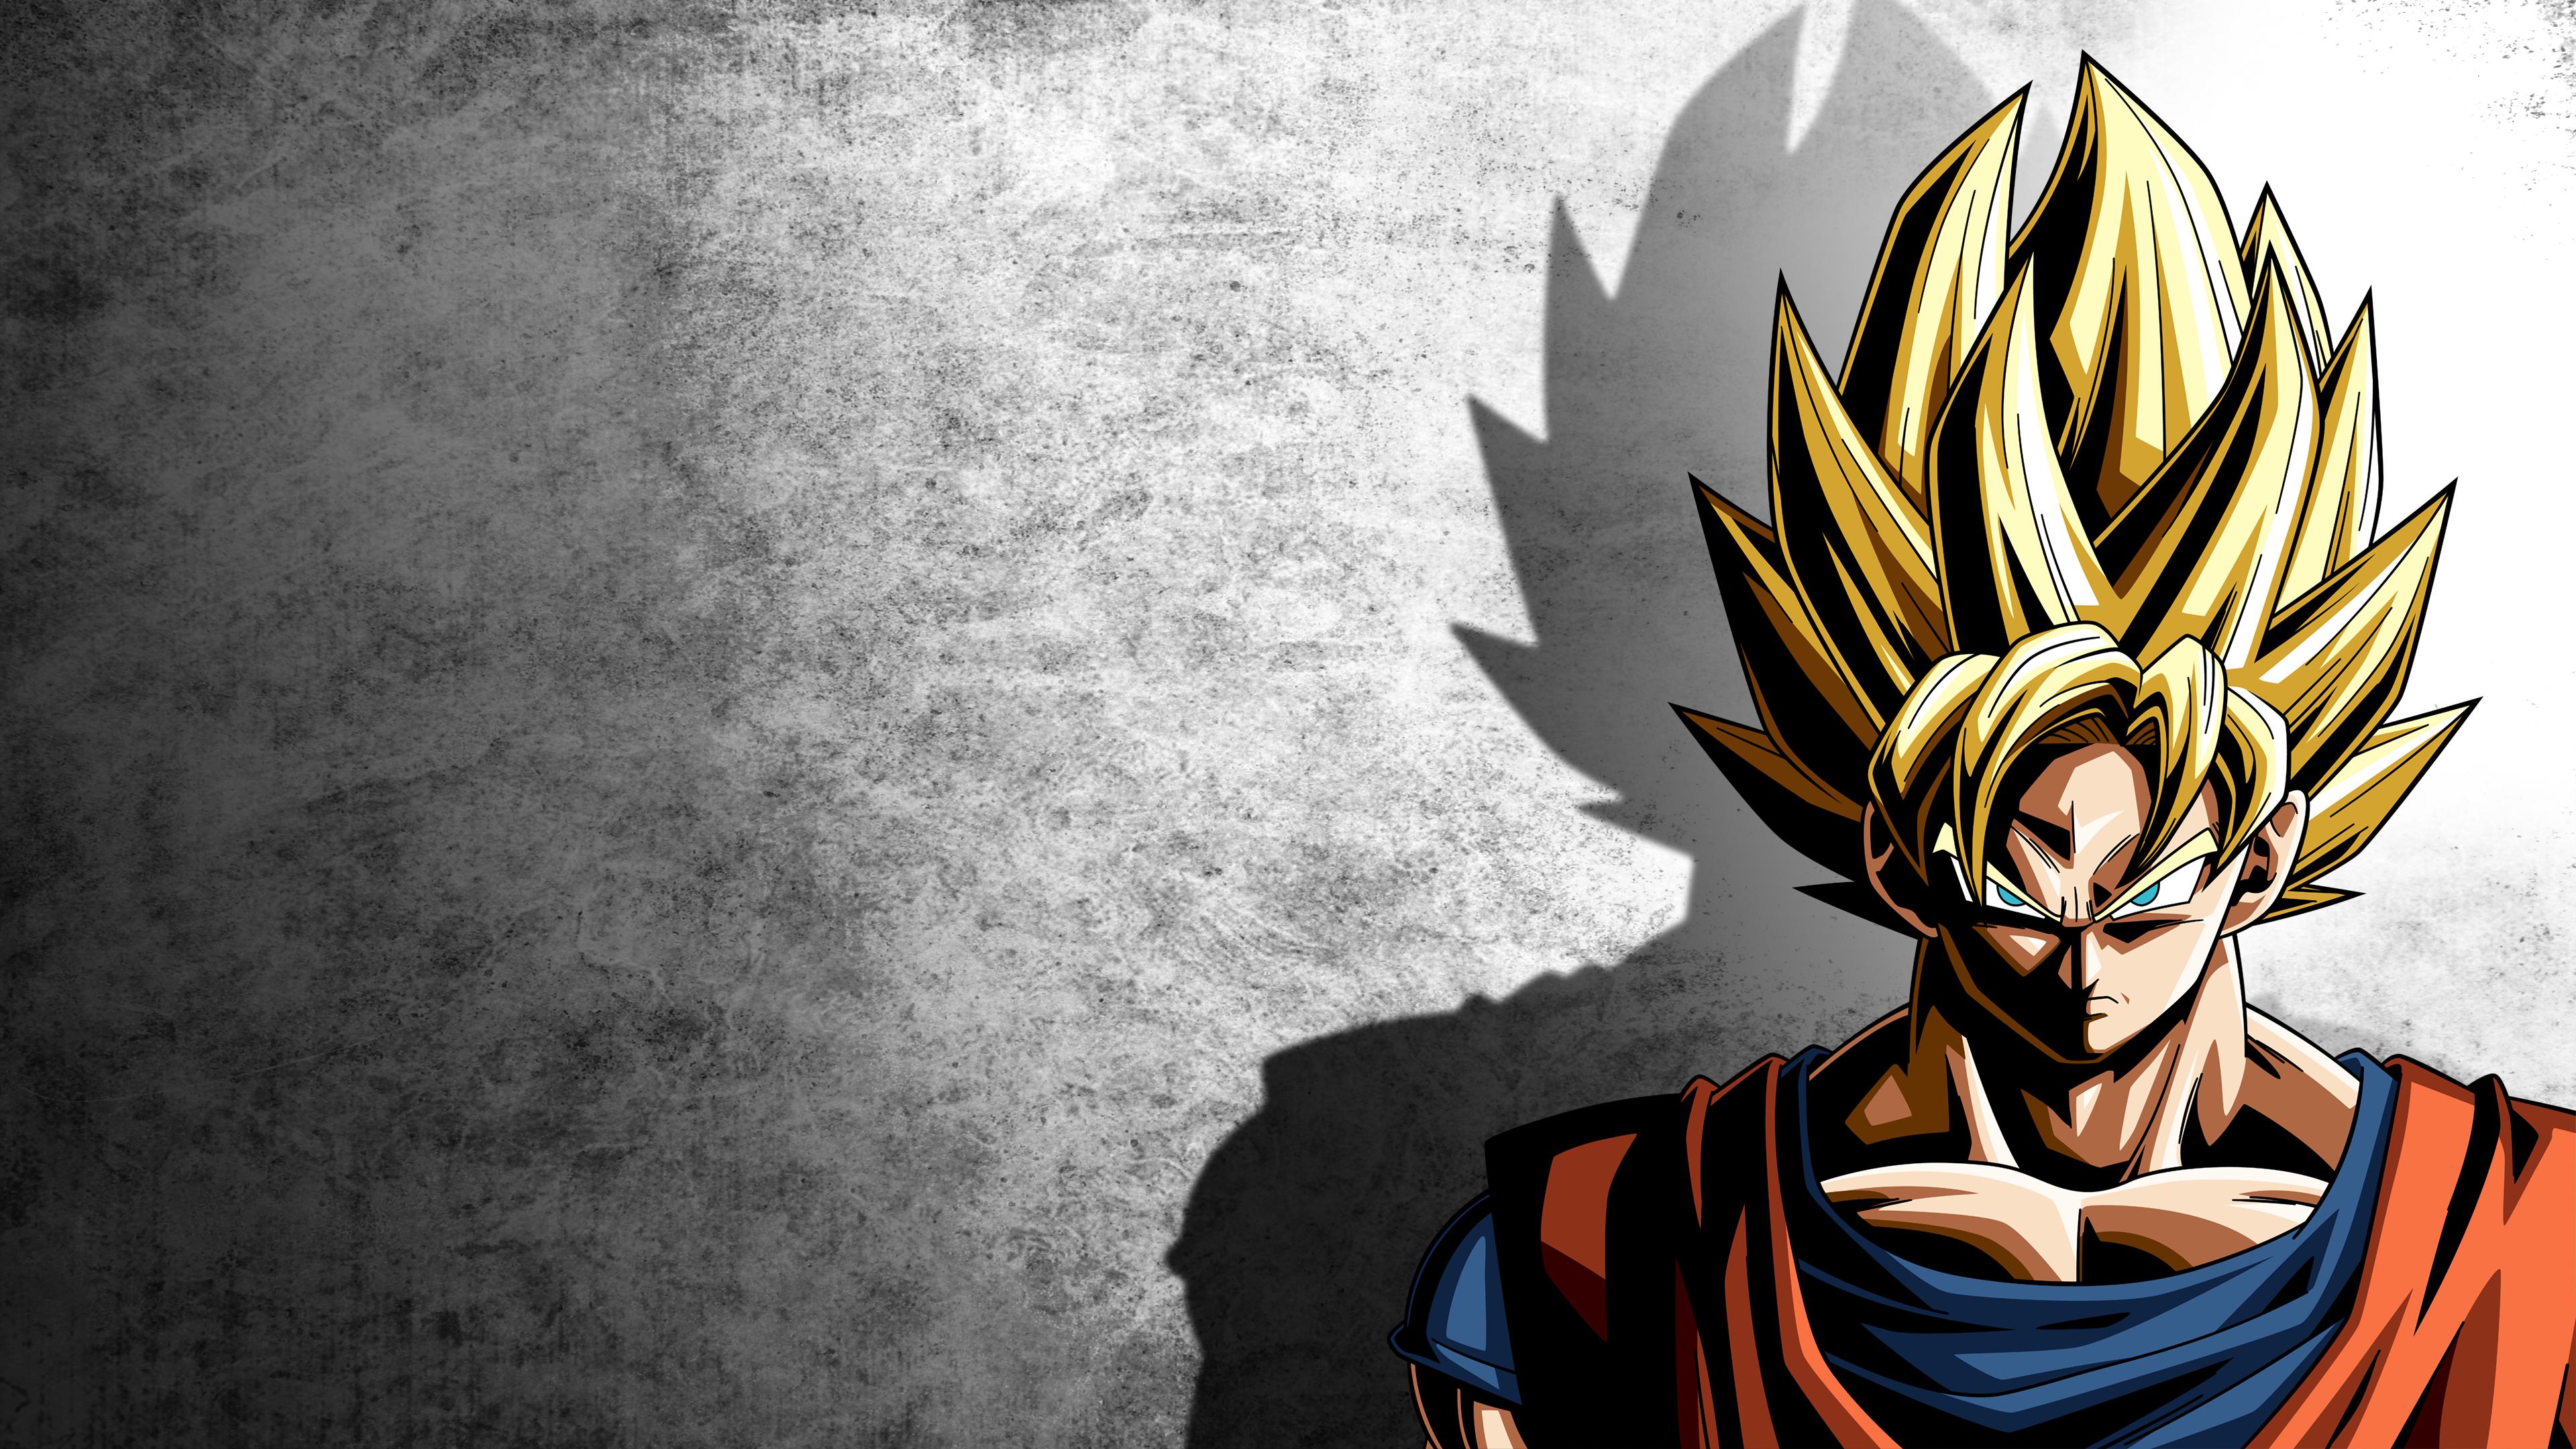 Dragon Ball Xenoverse 2 HD Wallpapers DBZ Goku wallpaper 3840x2160